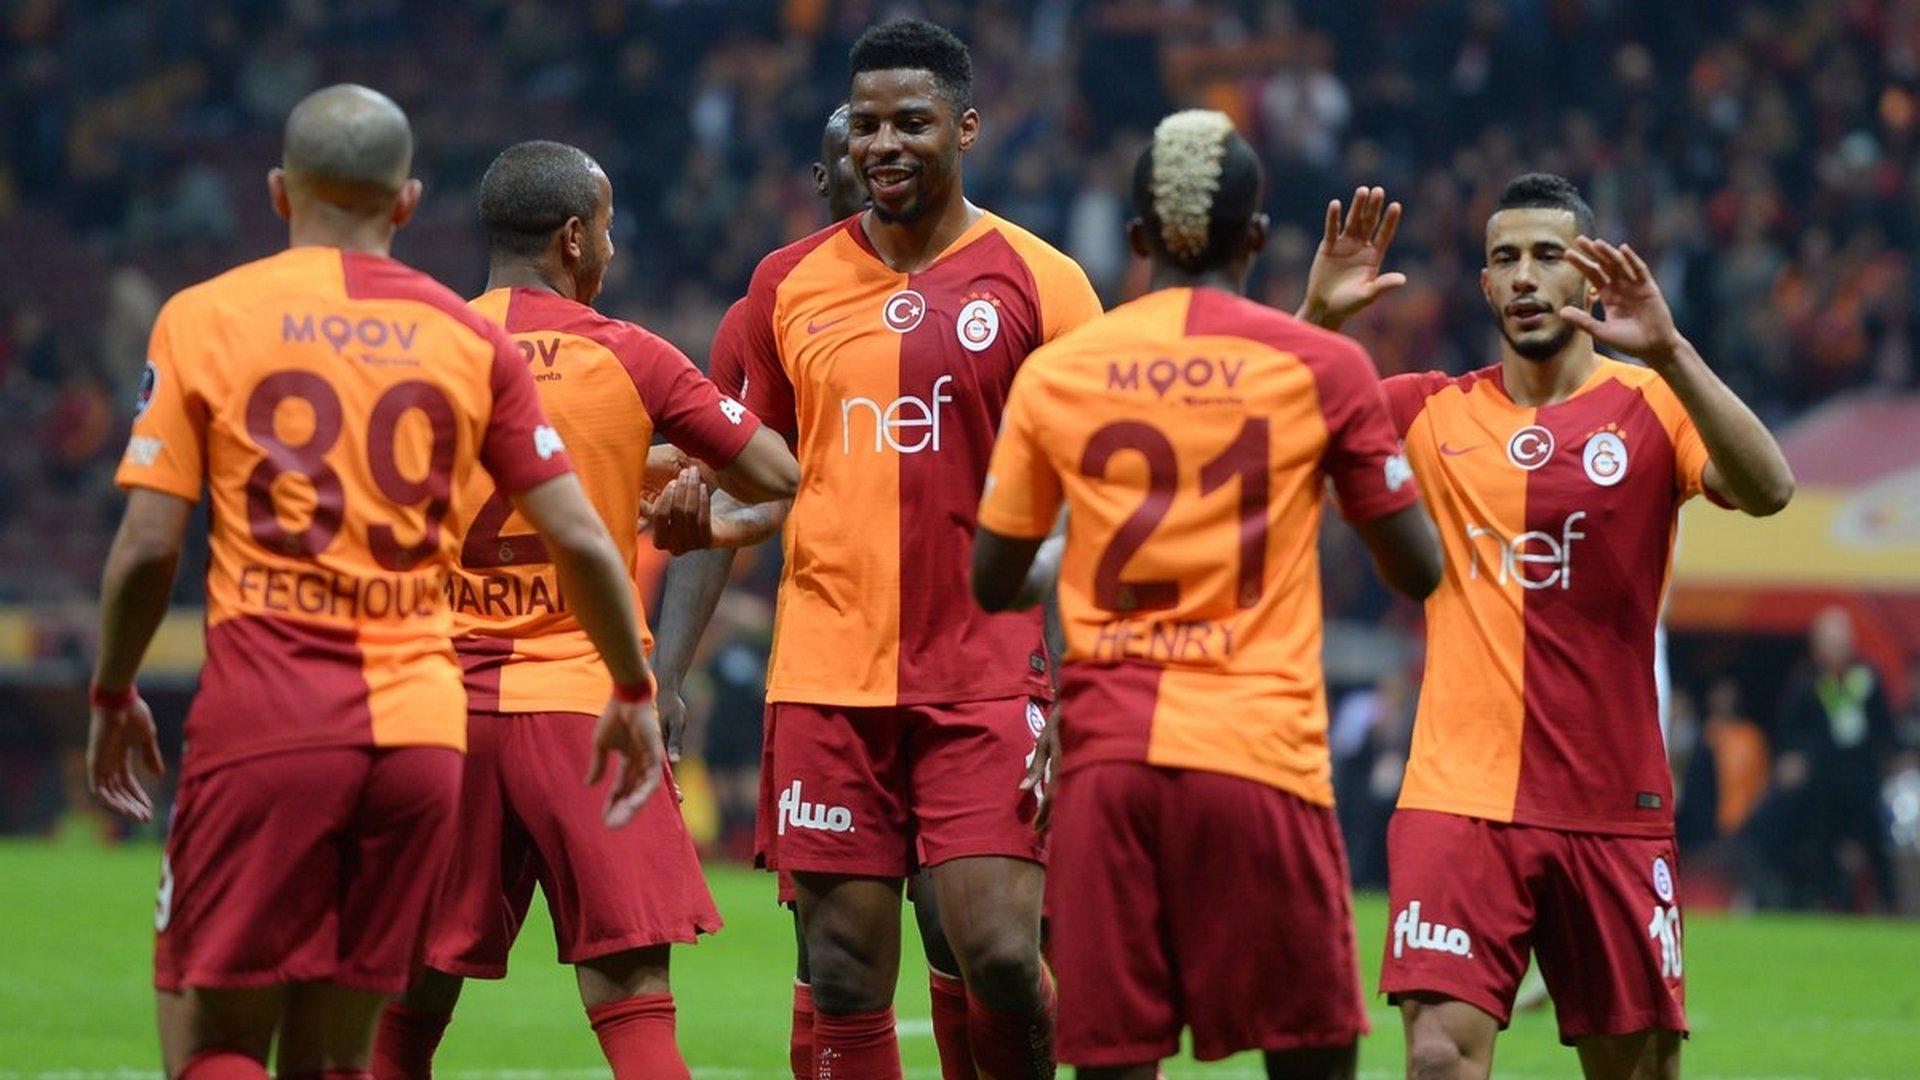 'Galatasaray'da 4 transfer! İşte anlaşılan futbolcular